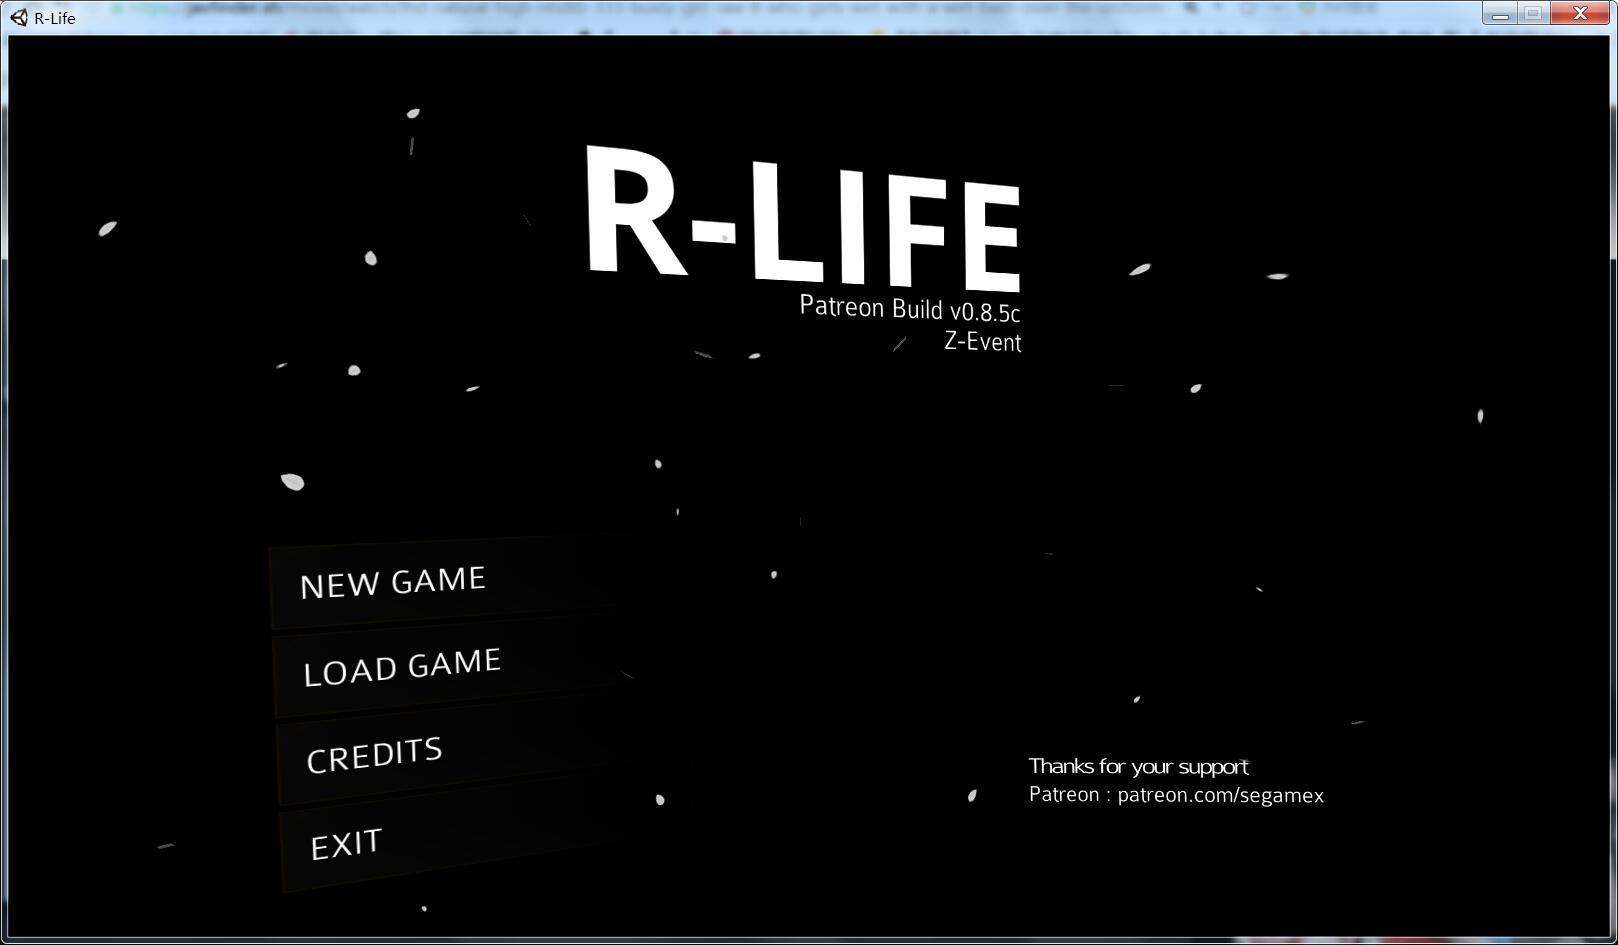 【ACT3D】R-LIFE~和蕾姆一起荒岛求生 Ver0.8.5b【4.2G】